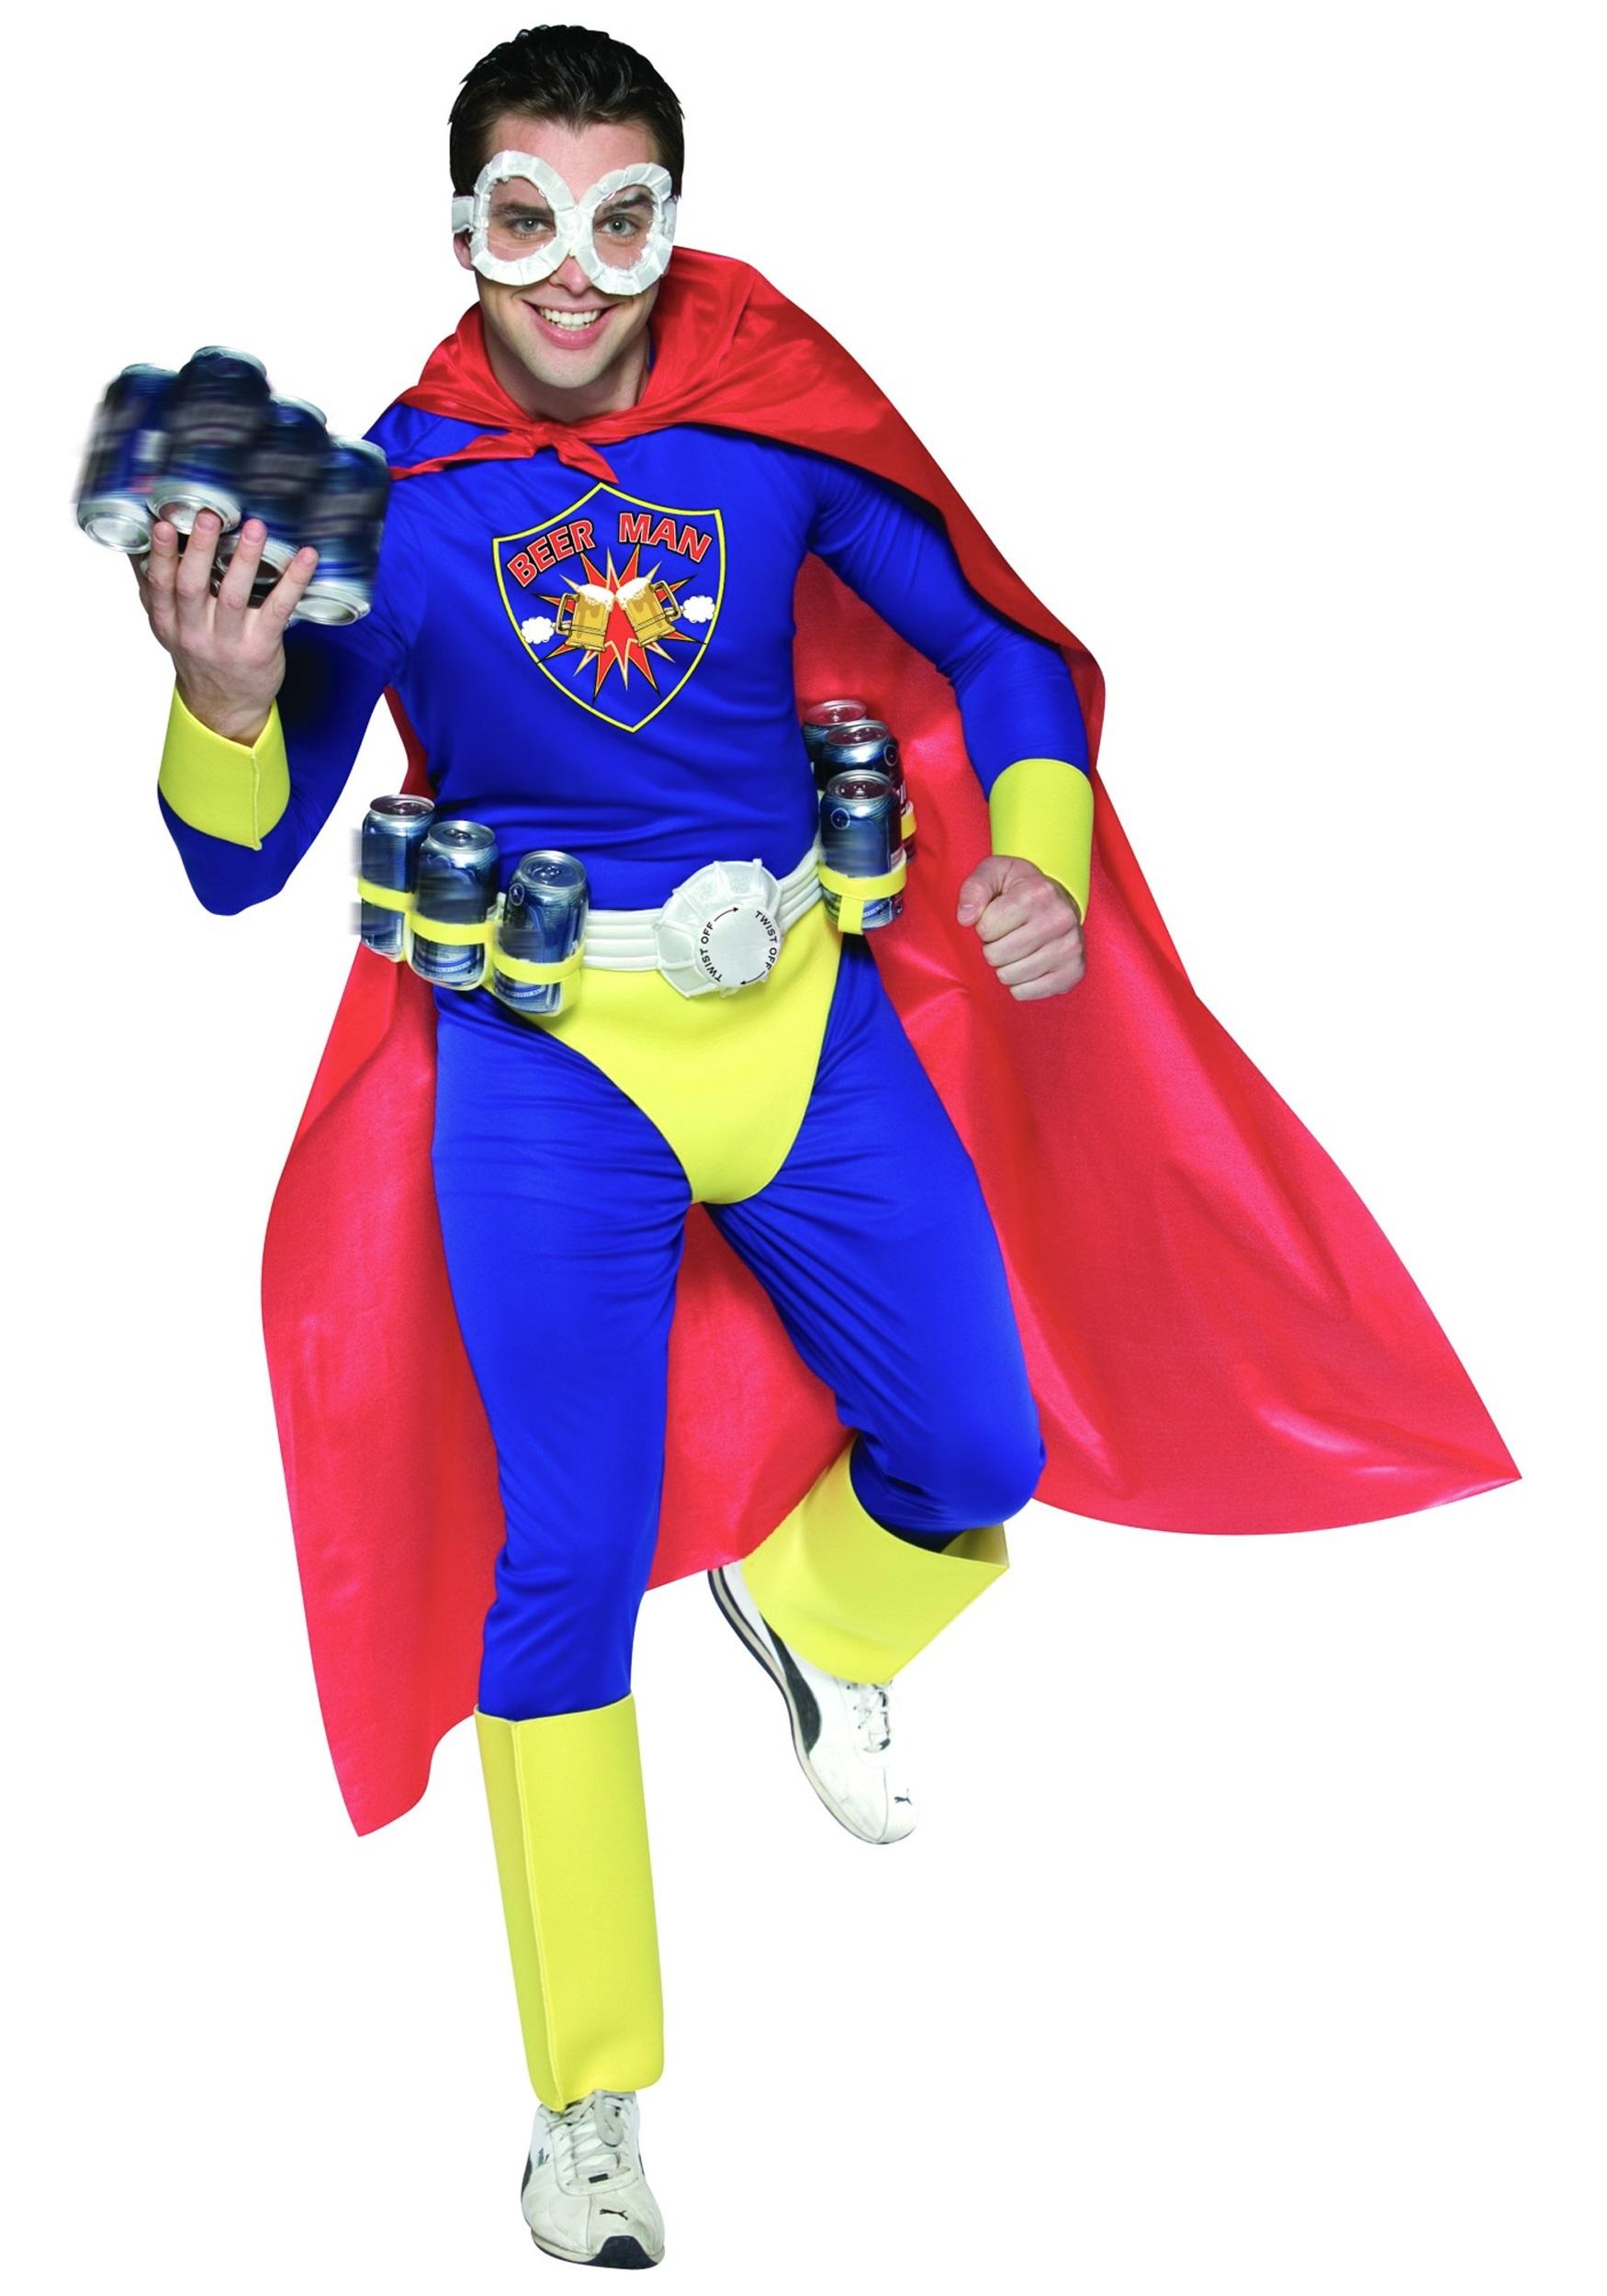 Beer Man Superhero Costume  Adult Funny Halloween Costumes - Super Funny Halloween Costumes